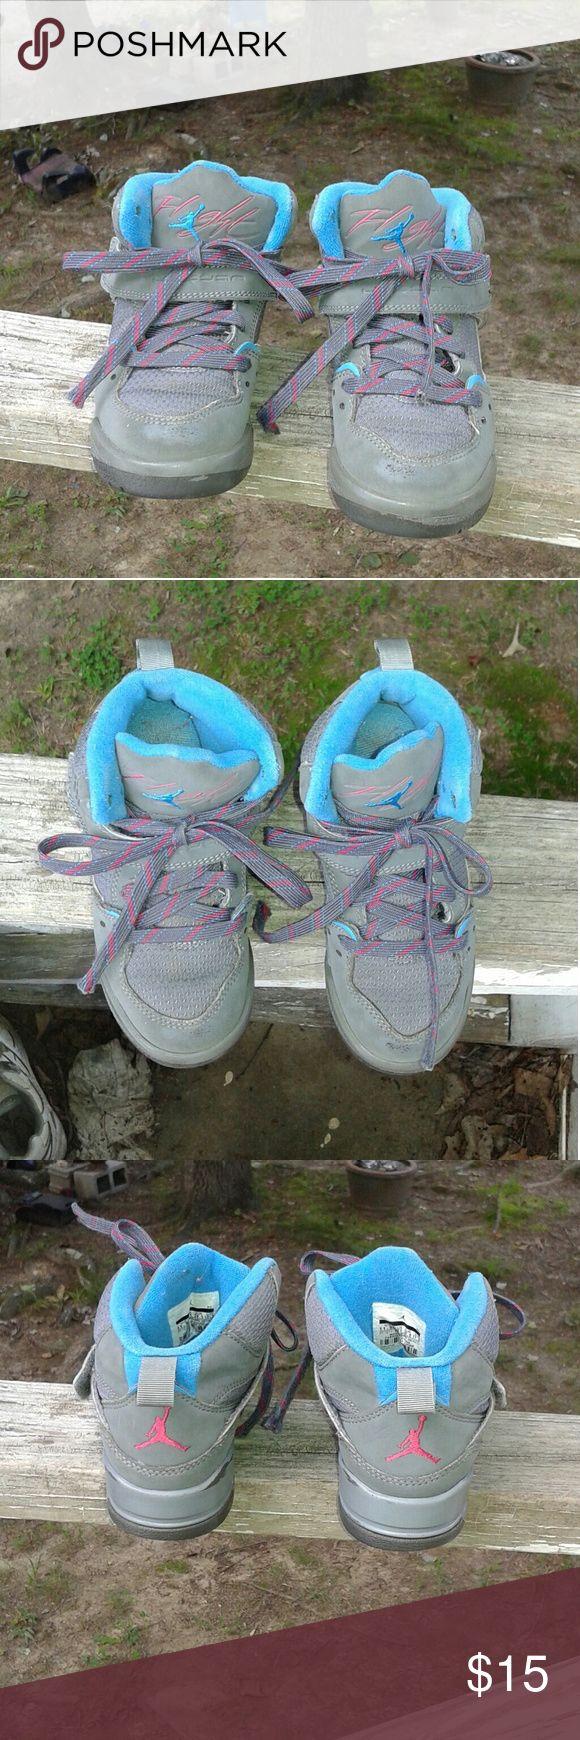 Selling this Jordan Flight High Top shoe's Boys size 11.5c on Poshmark! My username is: alicesales. #shopmycloset #poshmark #fashion #shopping #style #forsale #Jordan Flight  #Other